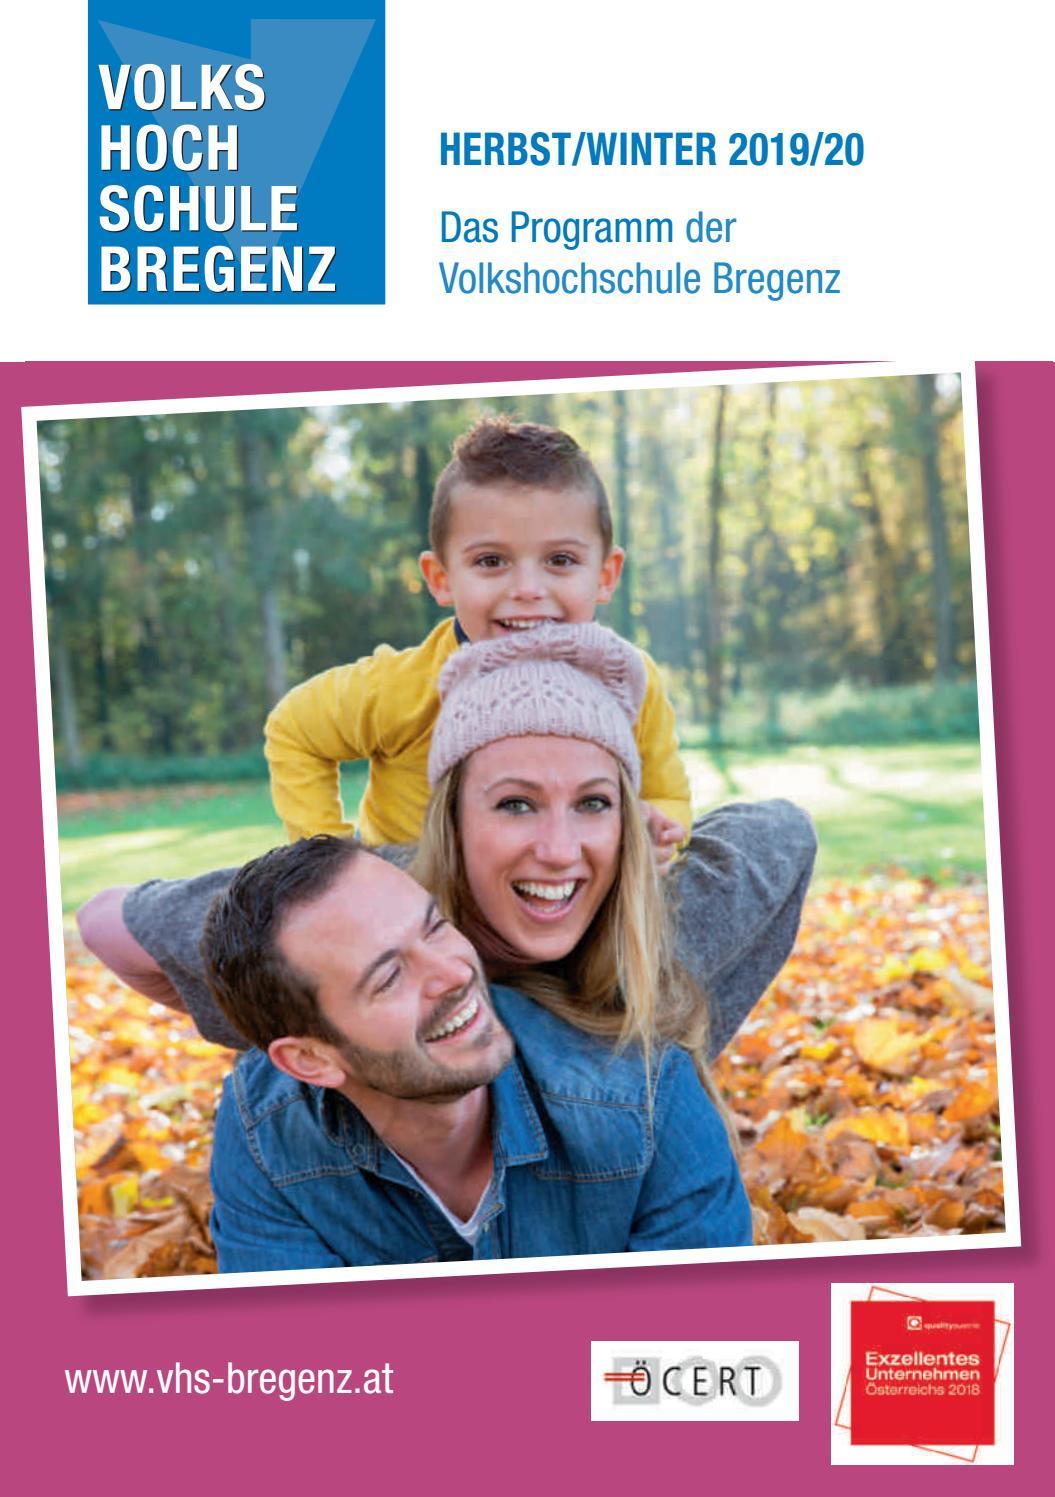 B wie lebenswert - Amt der Landeshauptstadt Bregenz